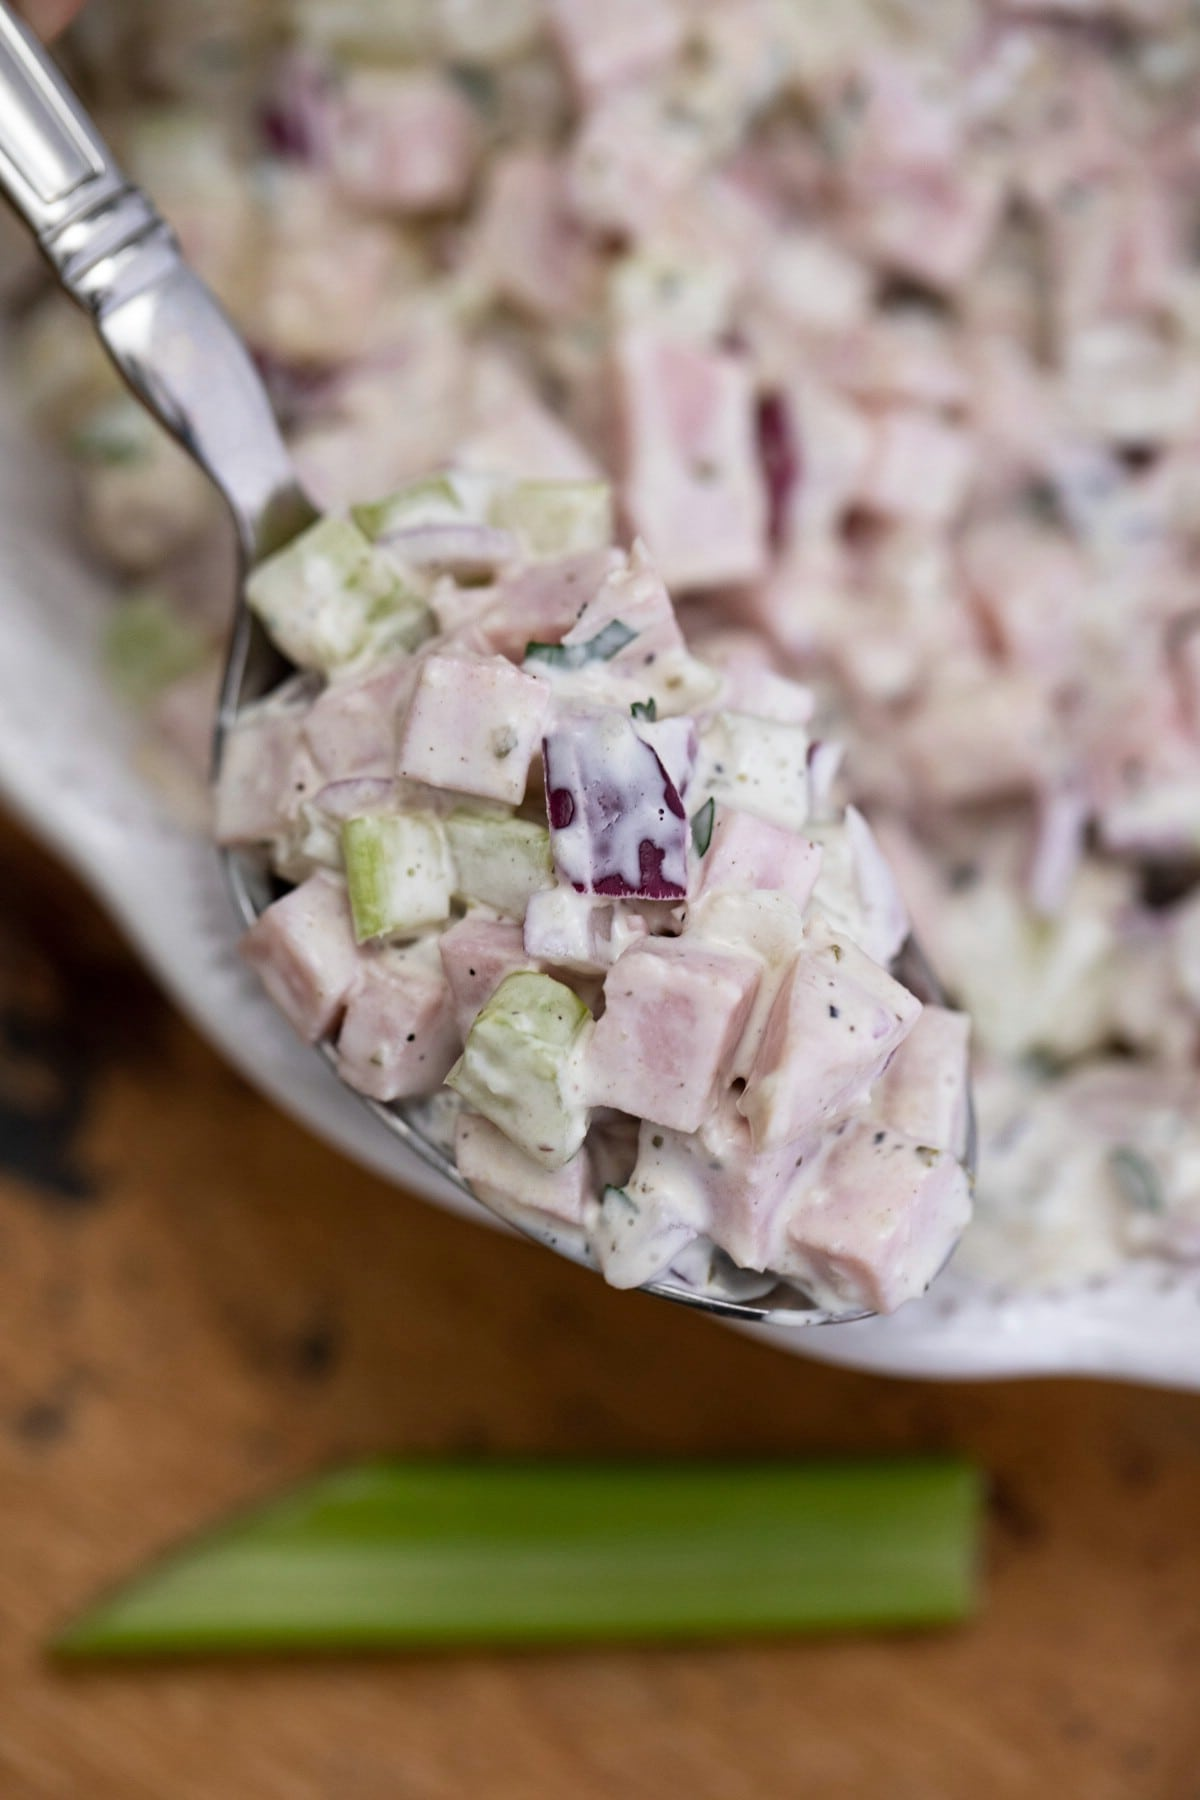 Spoon of ham salad